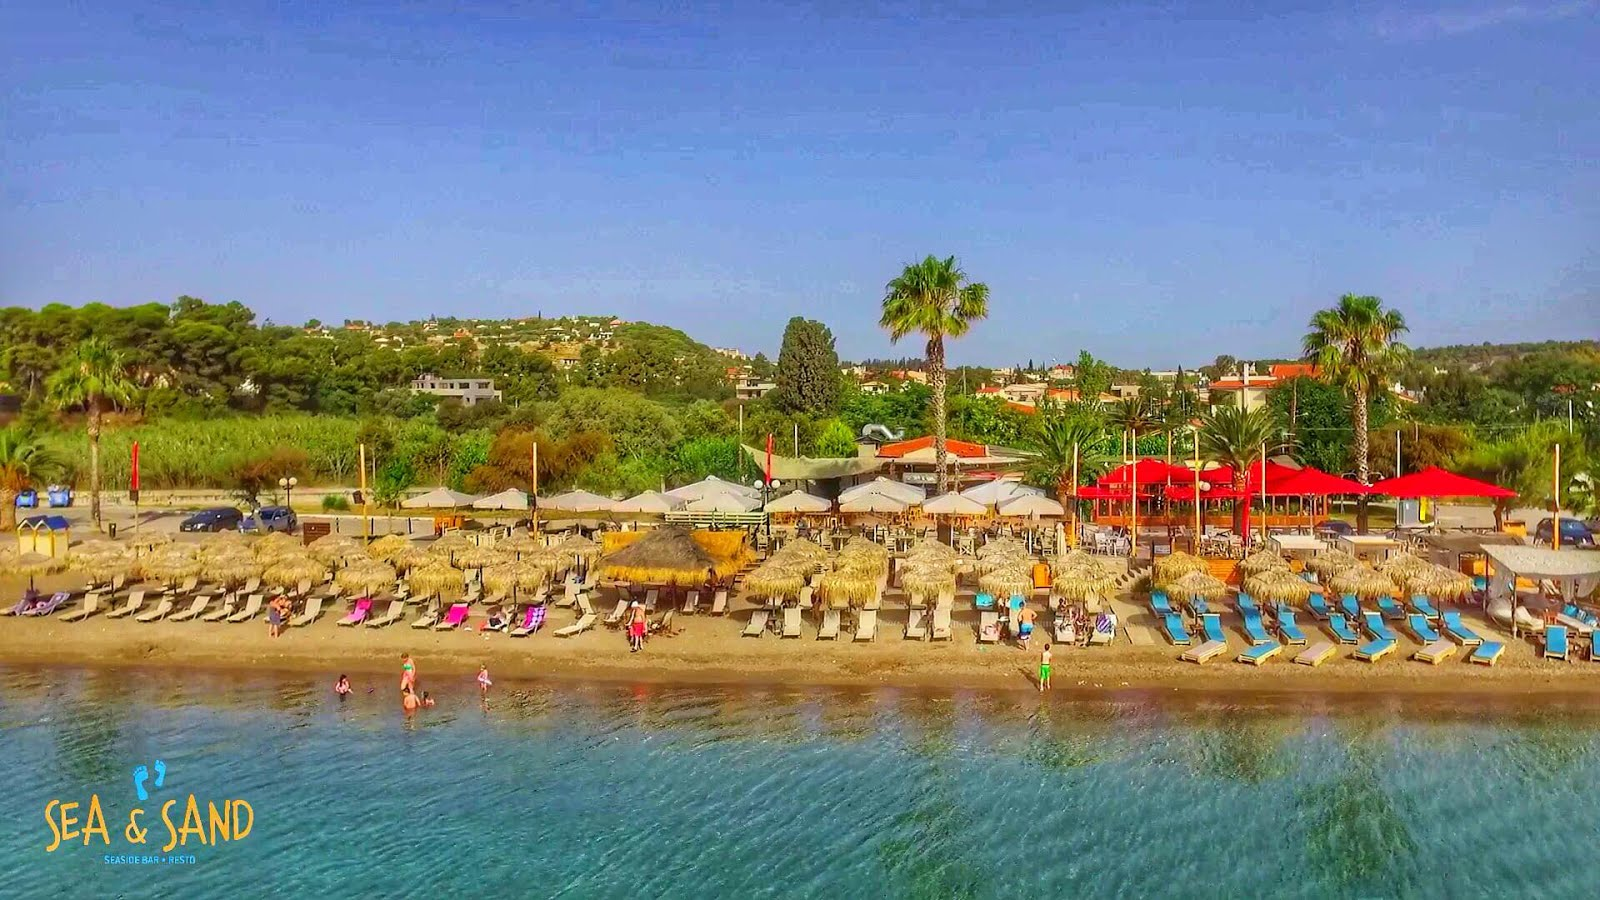 Sea &  Sand H  καλυτερη  επιλογη για  την καλοκαιρινη  σας  διασκεδαση